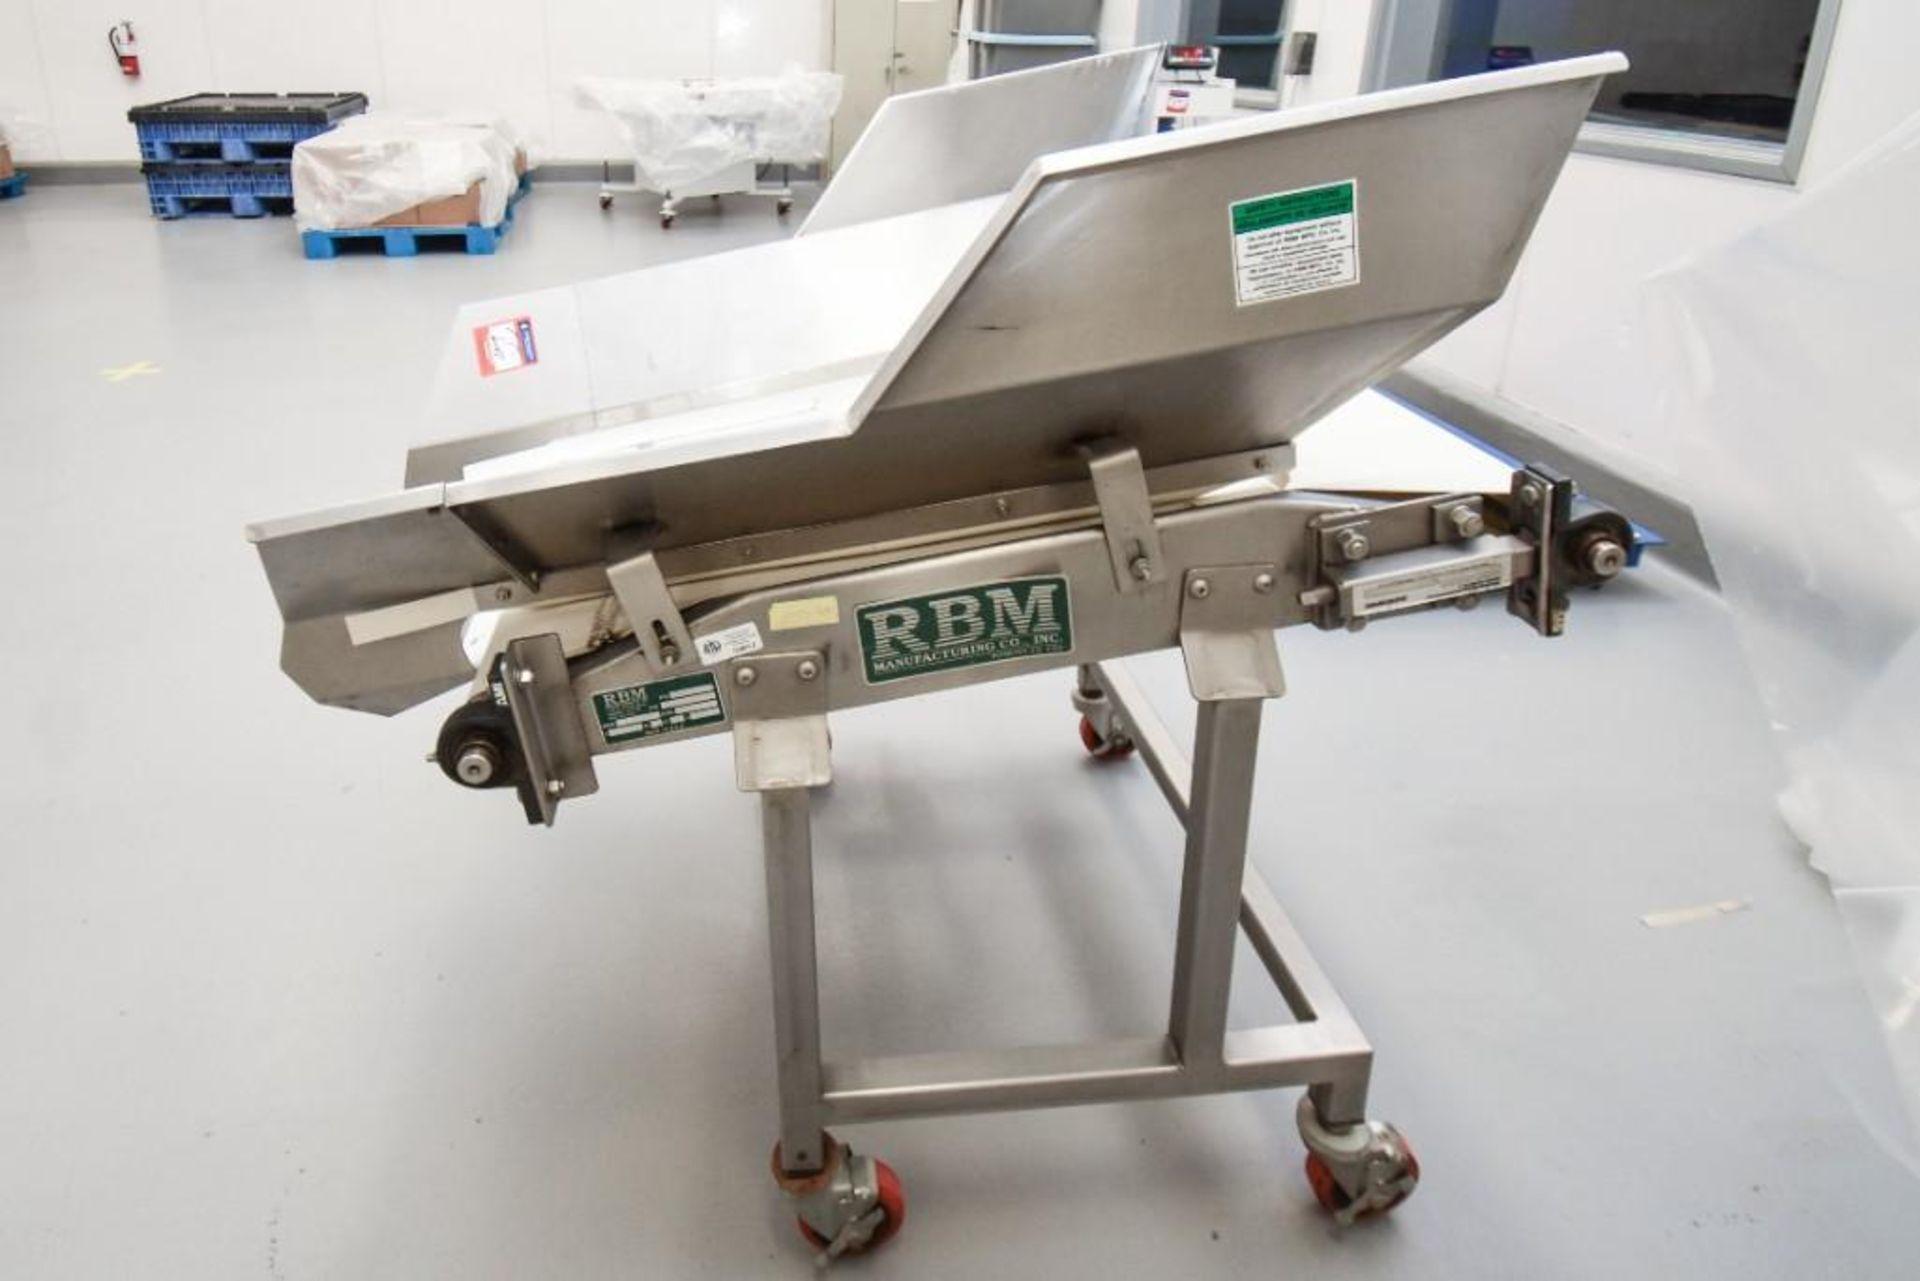 RBM Vibratory Deck With Food Grade Conveyor TS-B 24X3-0 - Image 6 of 7